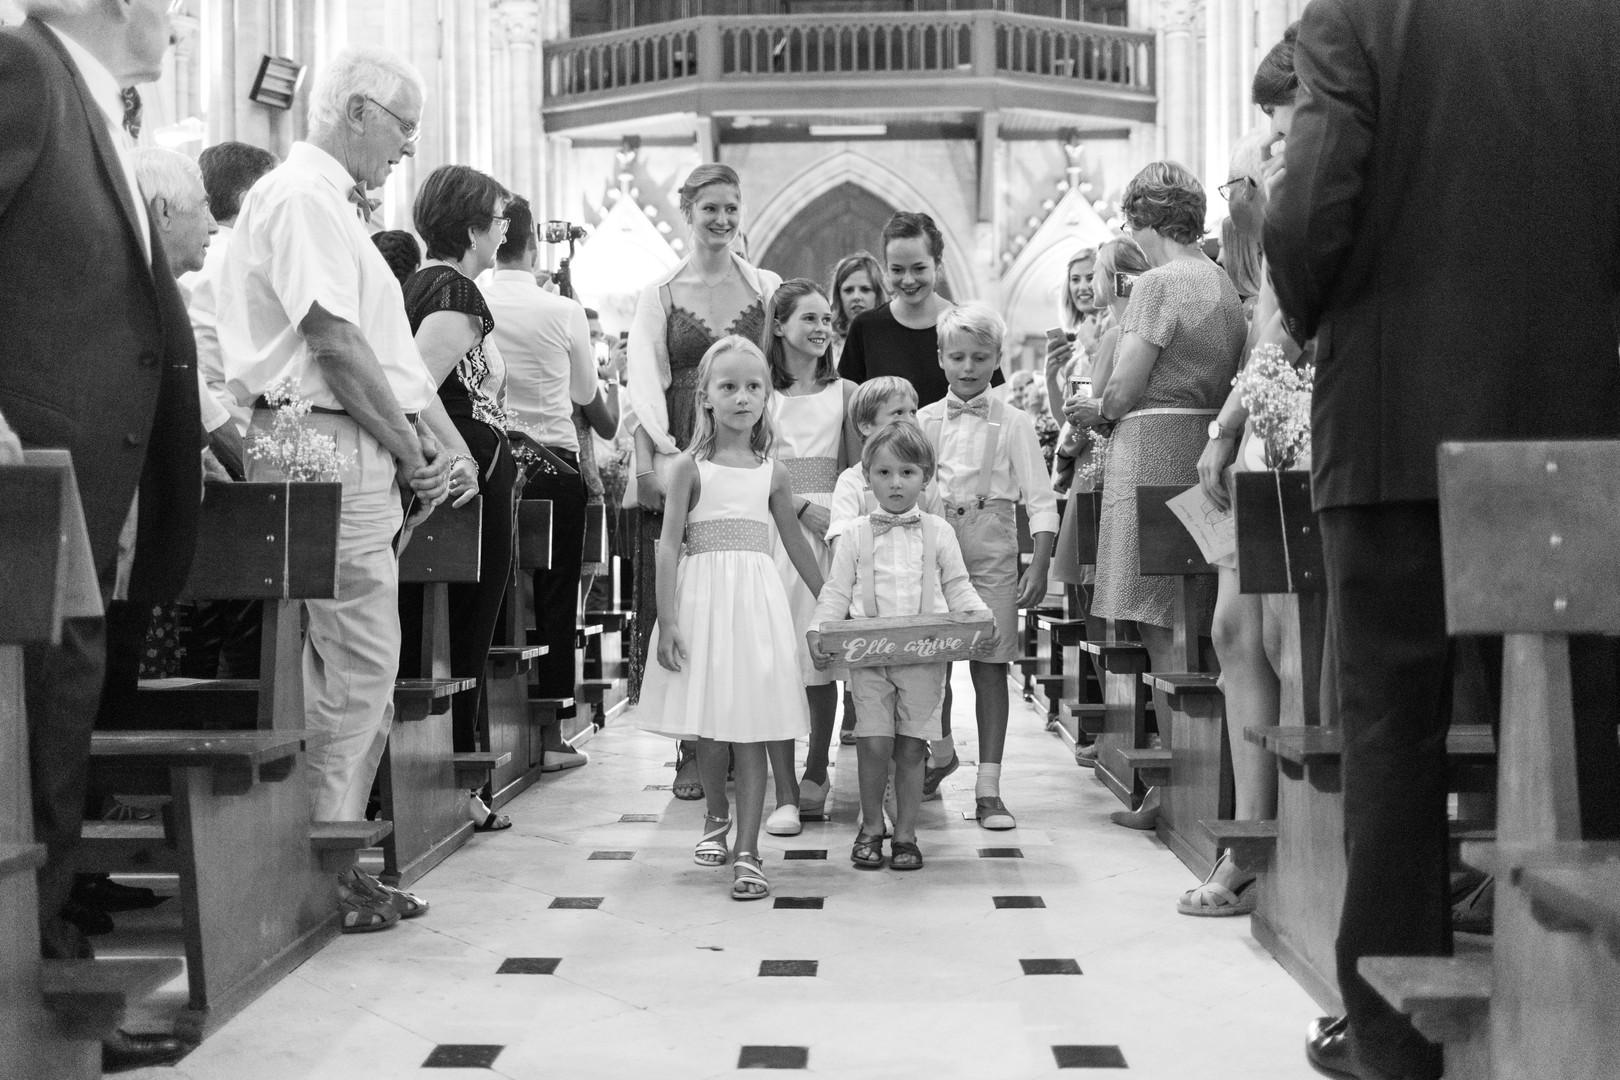 church enfants d'honneur church entry wedding photography photographie